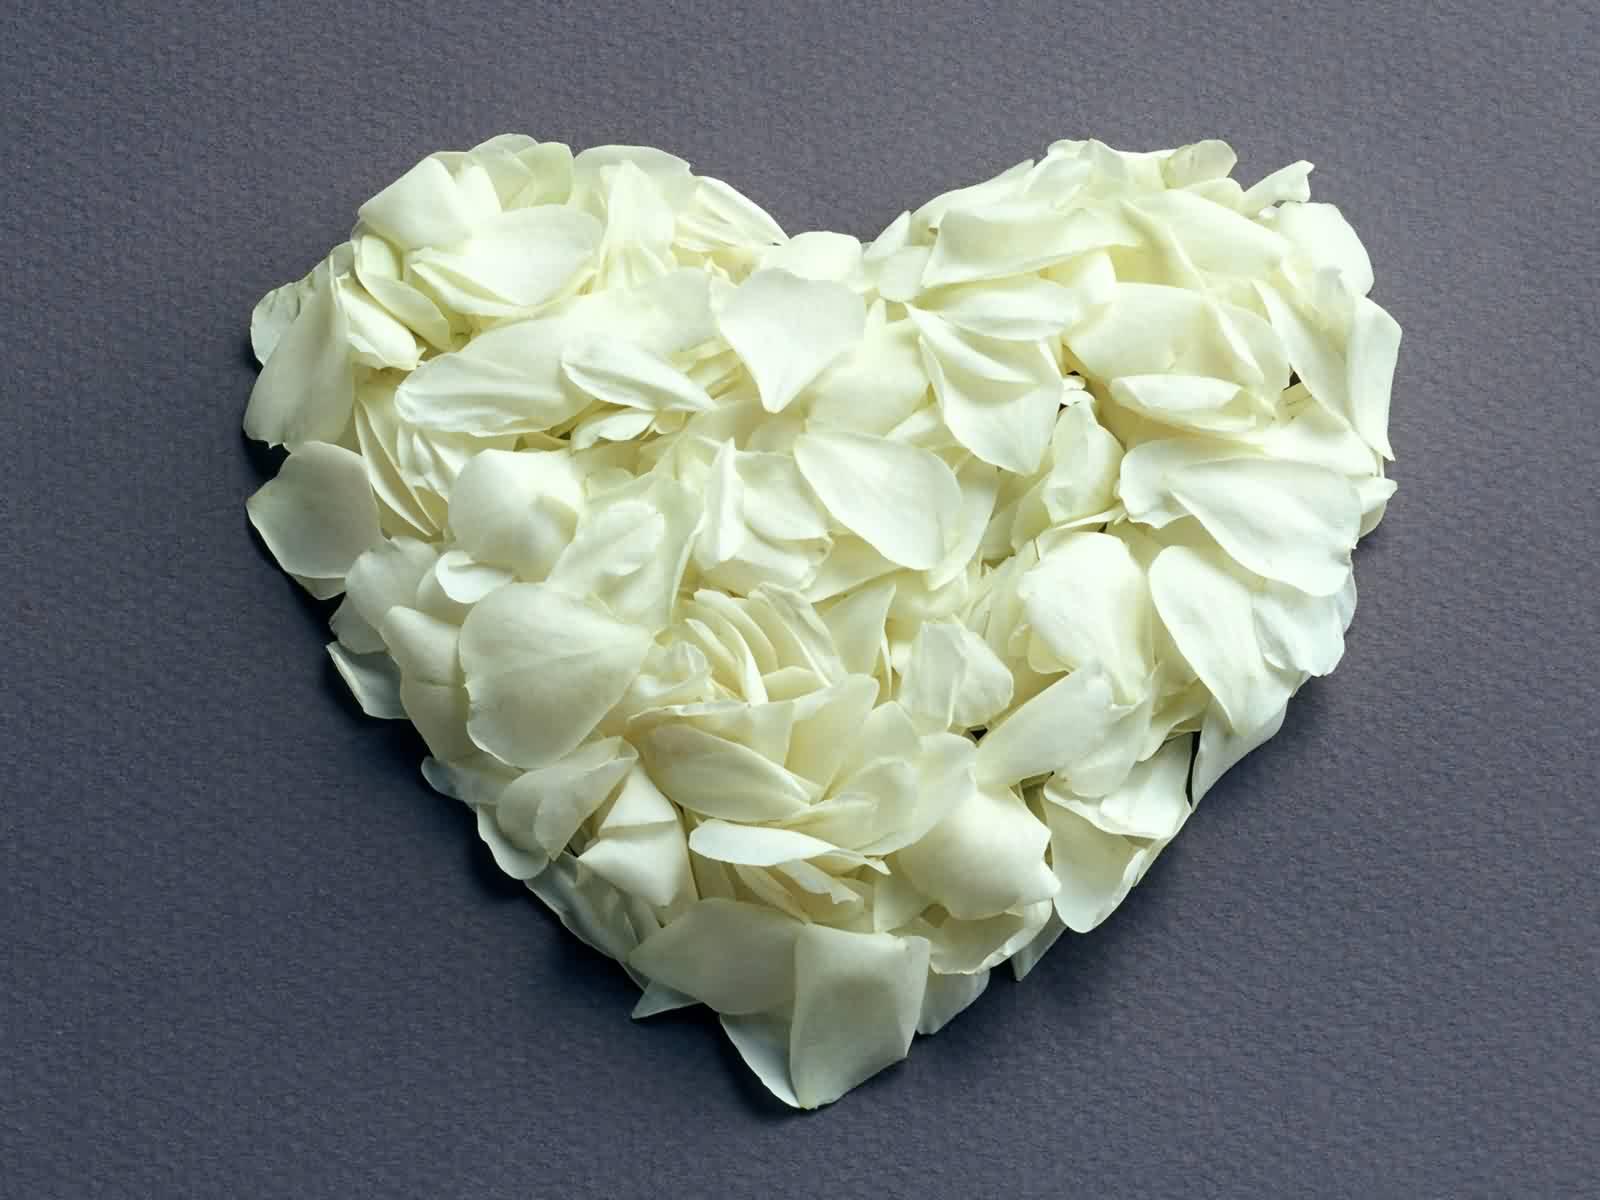 Hanakotoba (Bahasa Bunga) White_rose_1600x1200